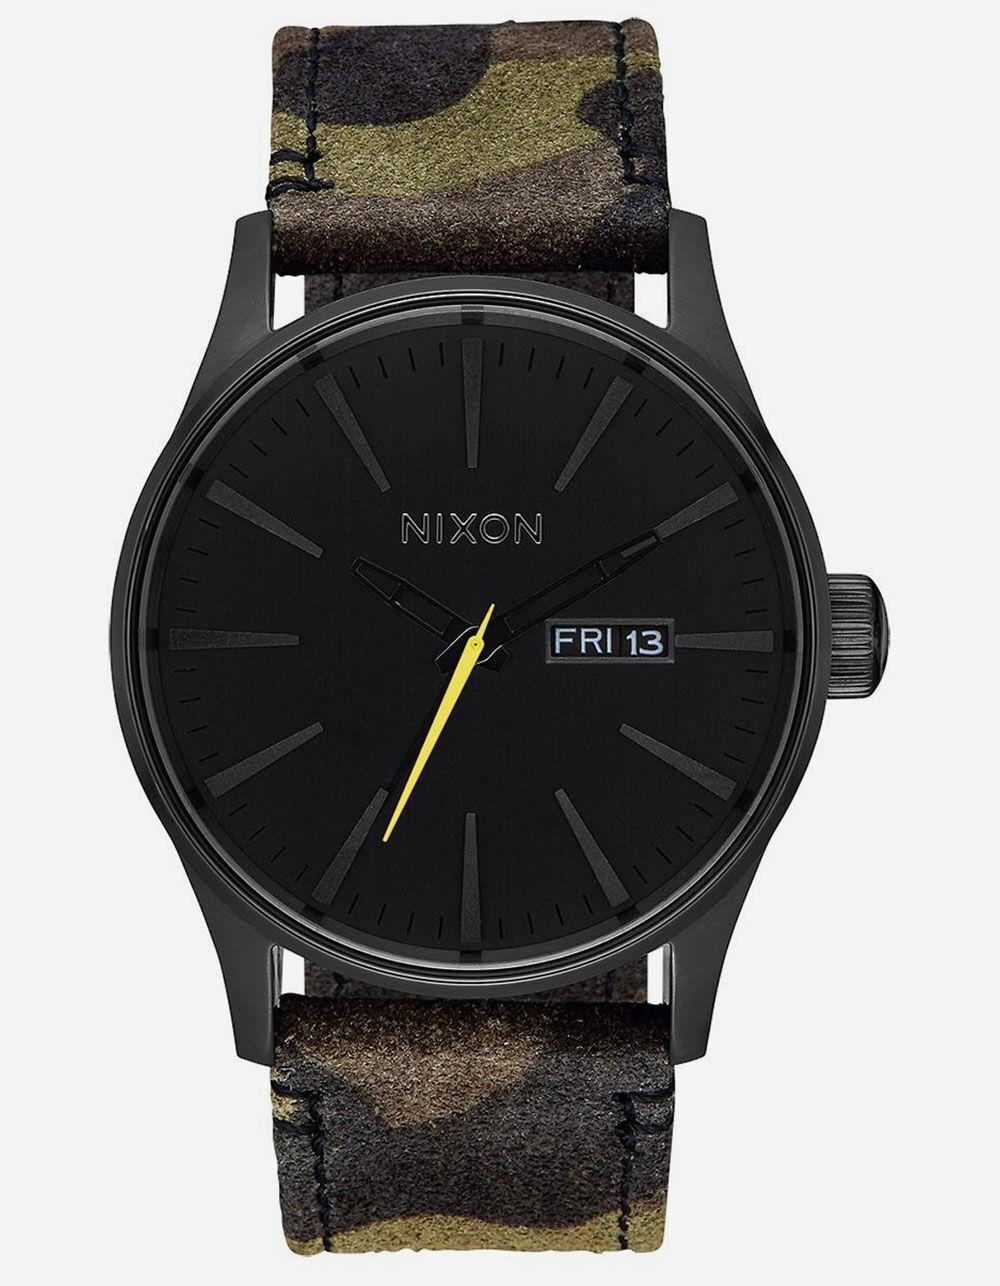 NIXON Sentry Leather Black & Camo Watch